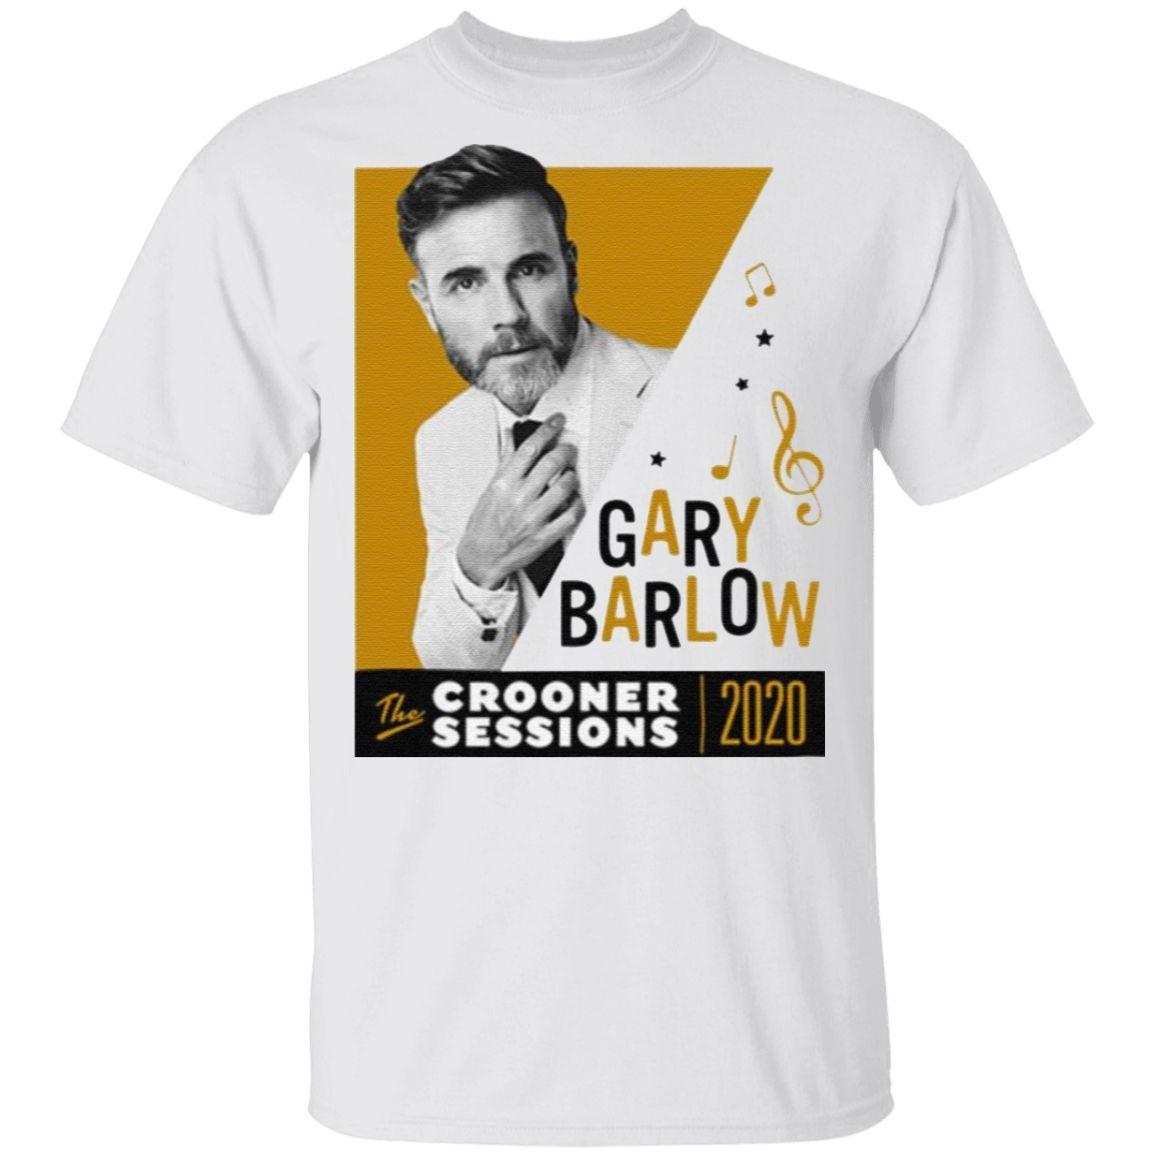 Gary Barlow The Crooner Sessions TShirt